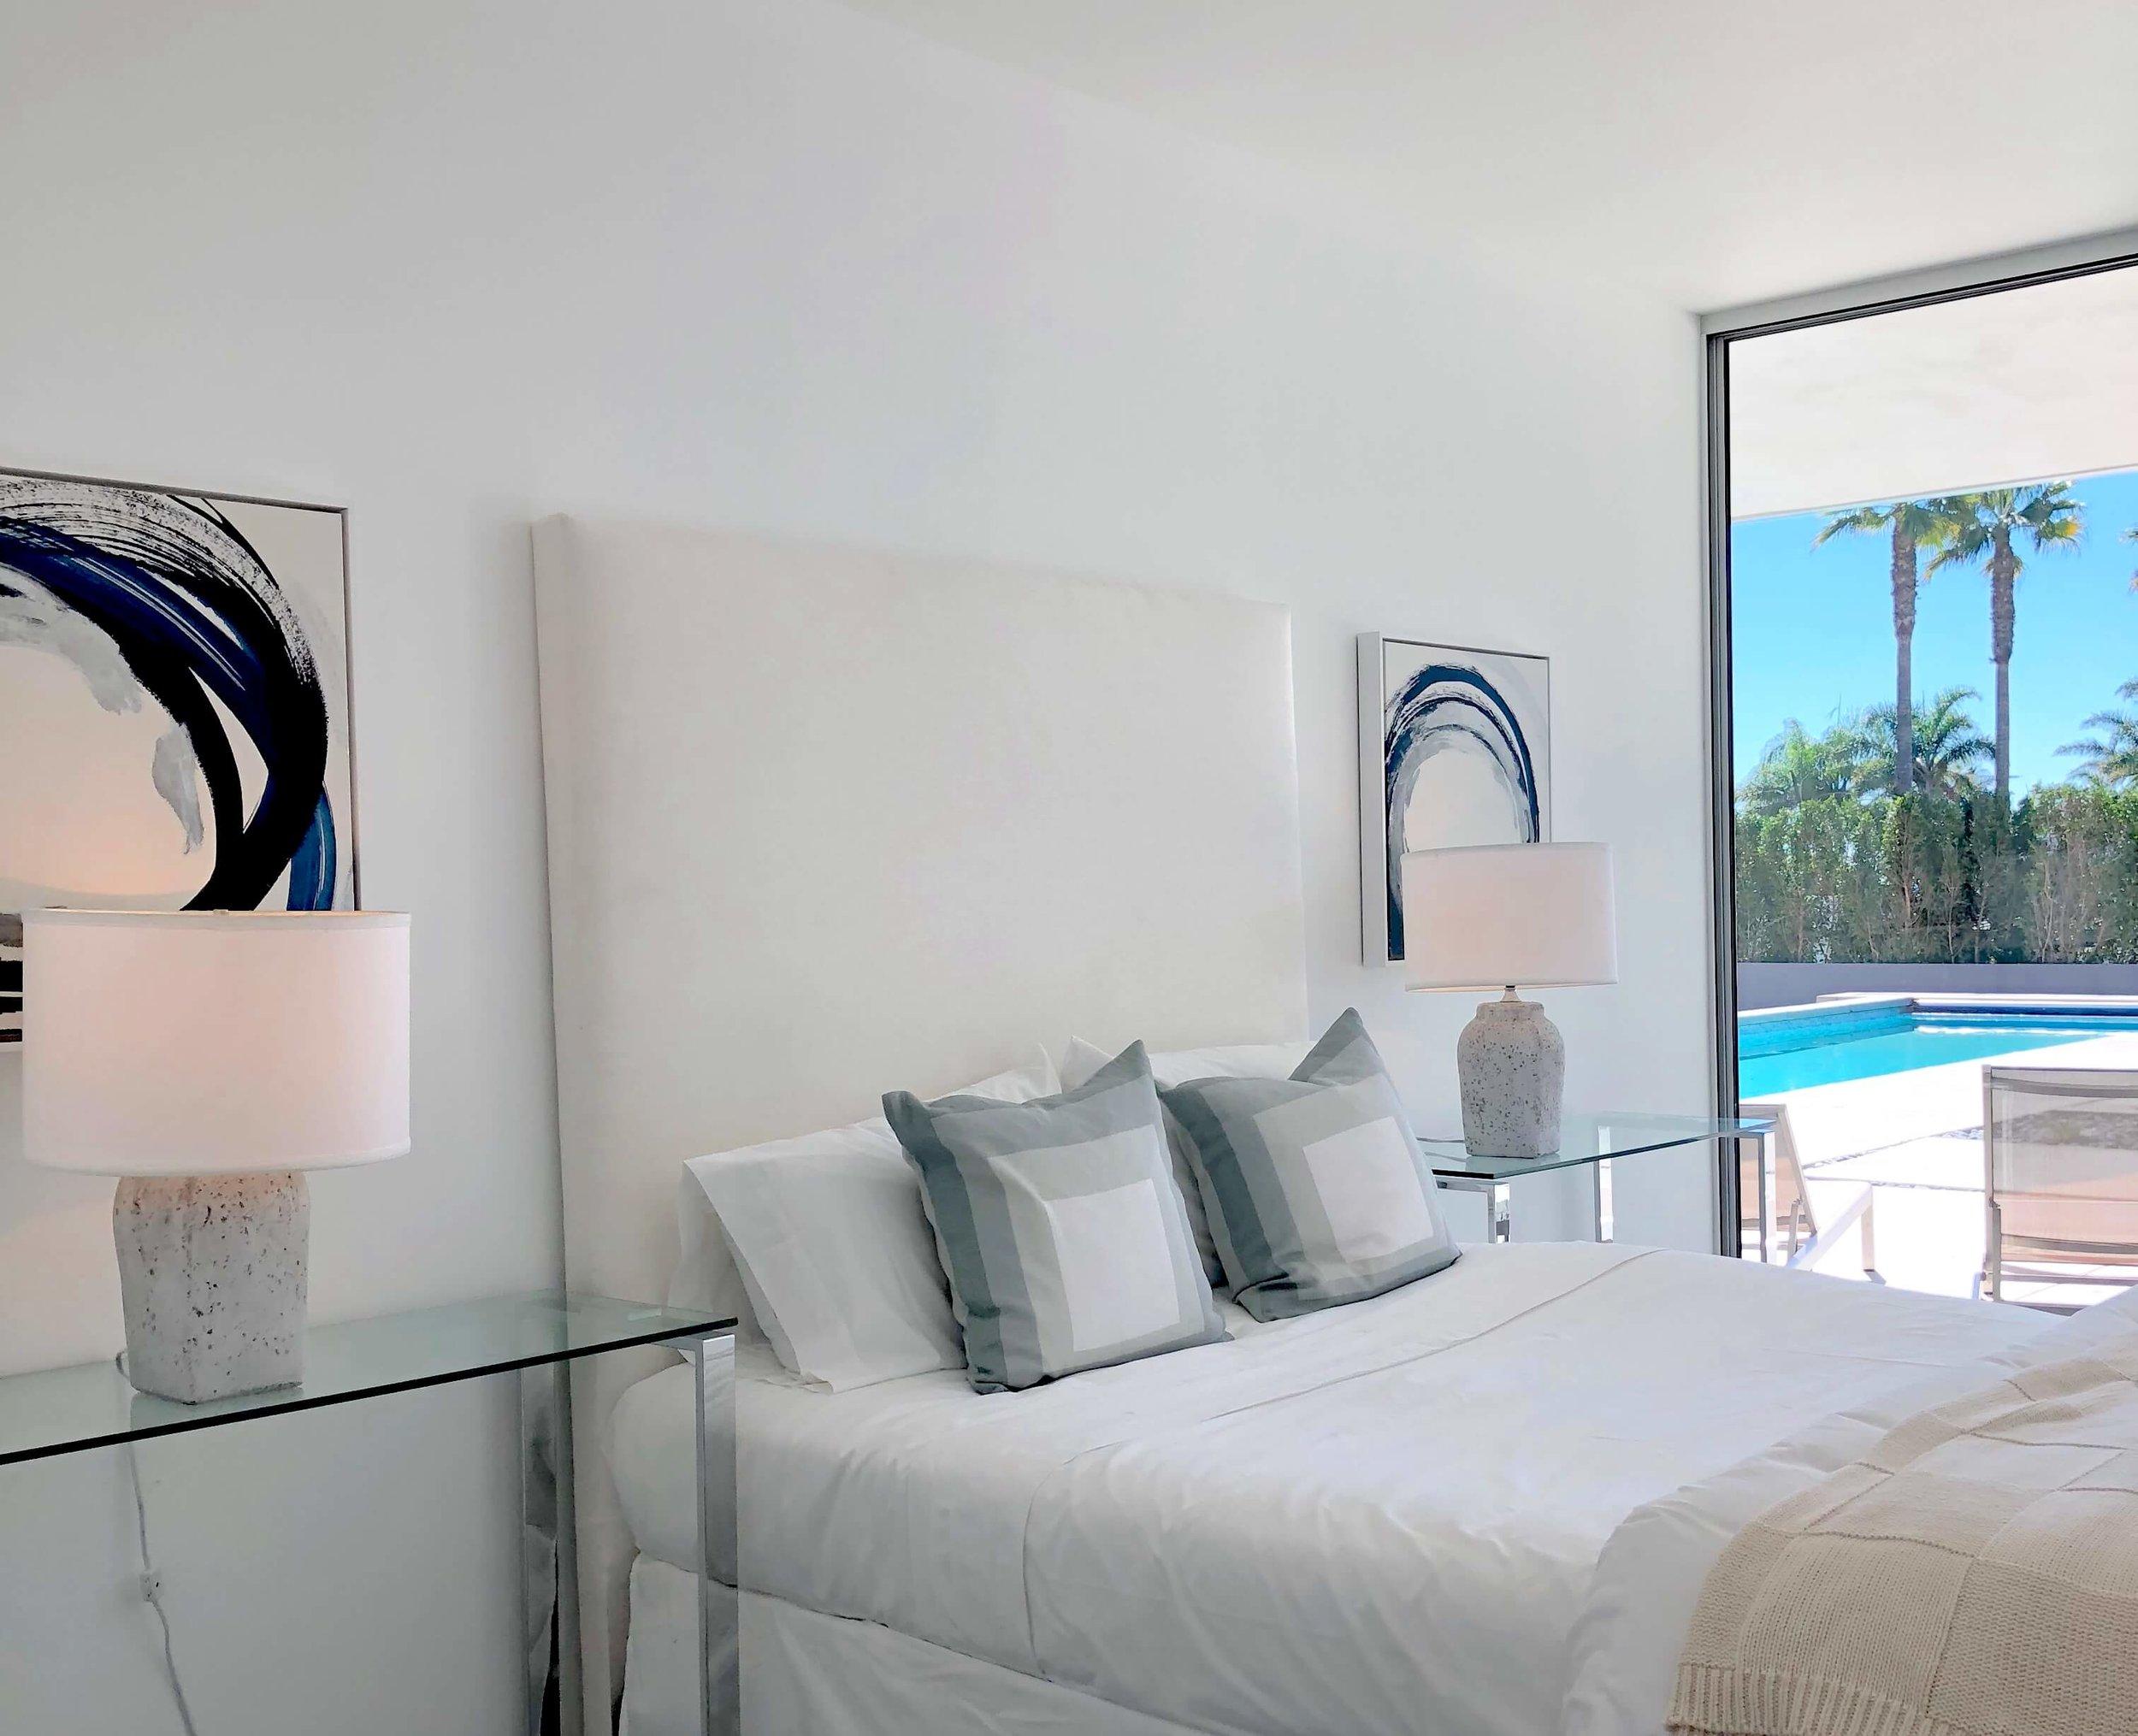 California contemporary design - Dwell on Design's Fall Home Tour, Designer: Vitus Mitare #contemporaryarchitecture #bedroom #slidingglassdoor